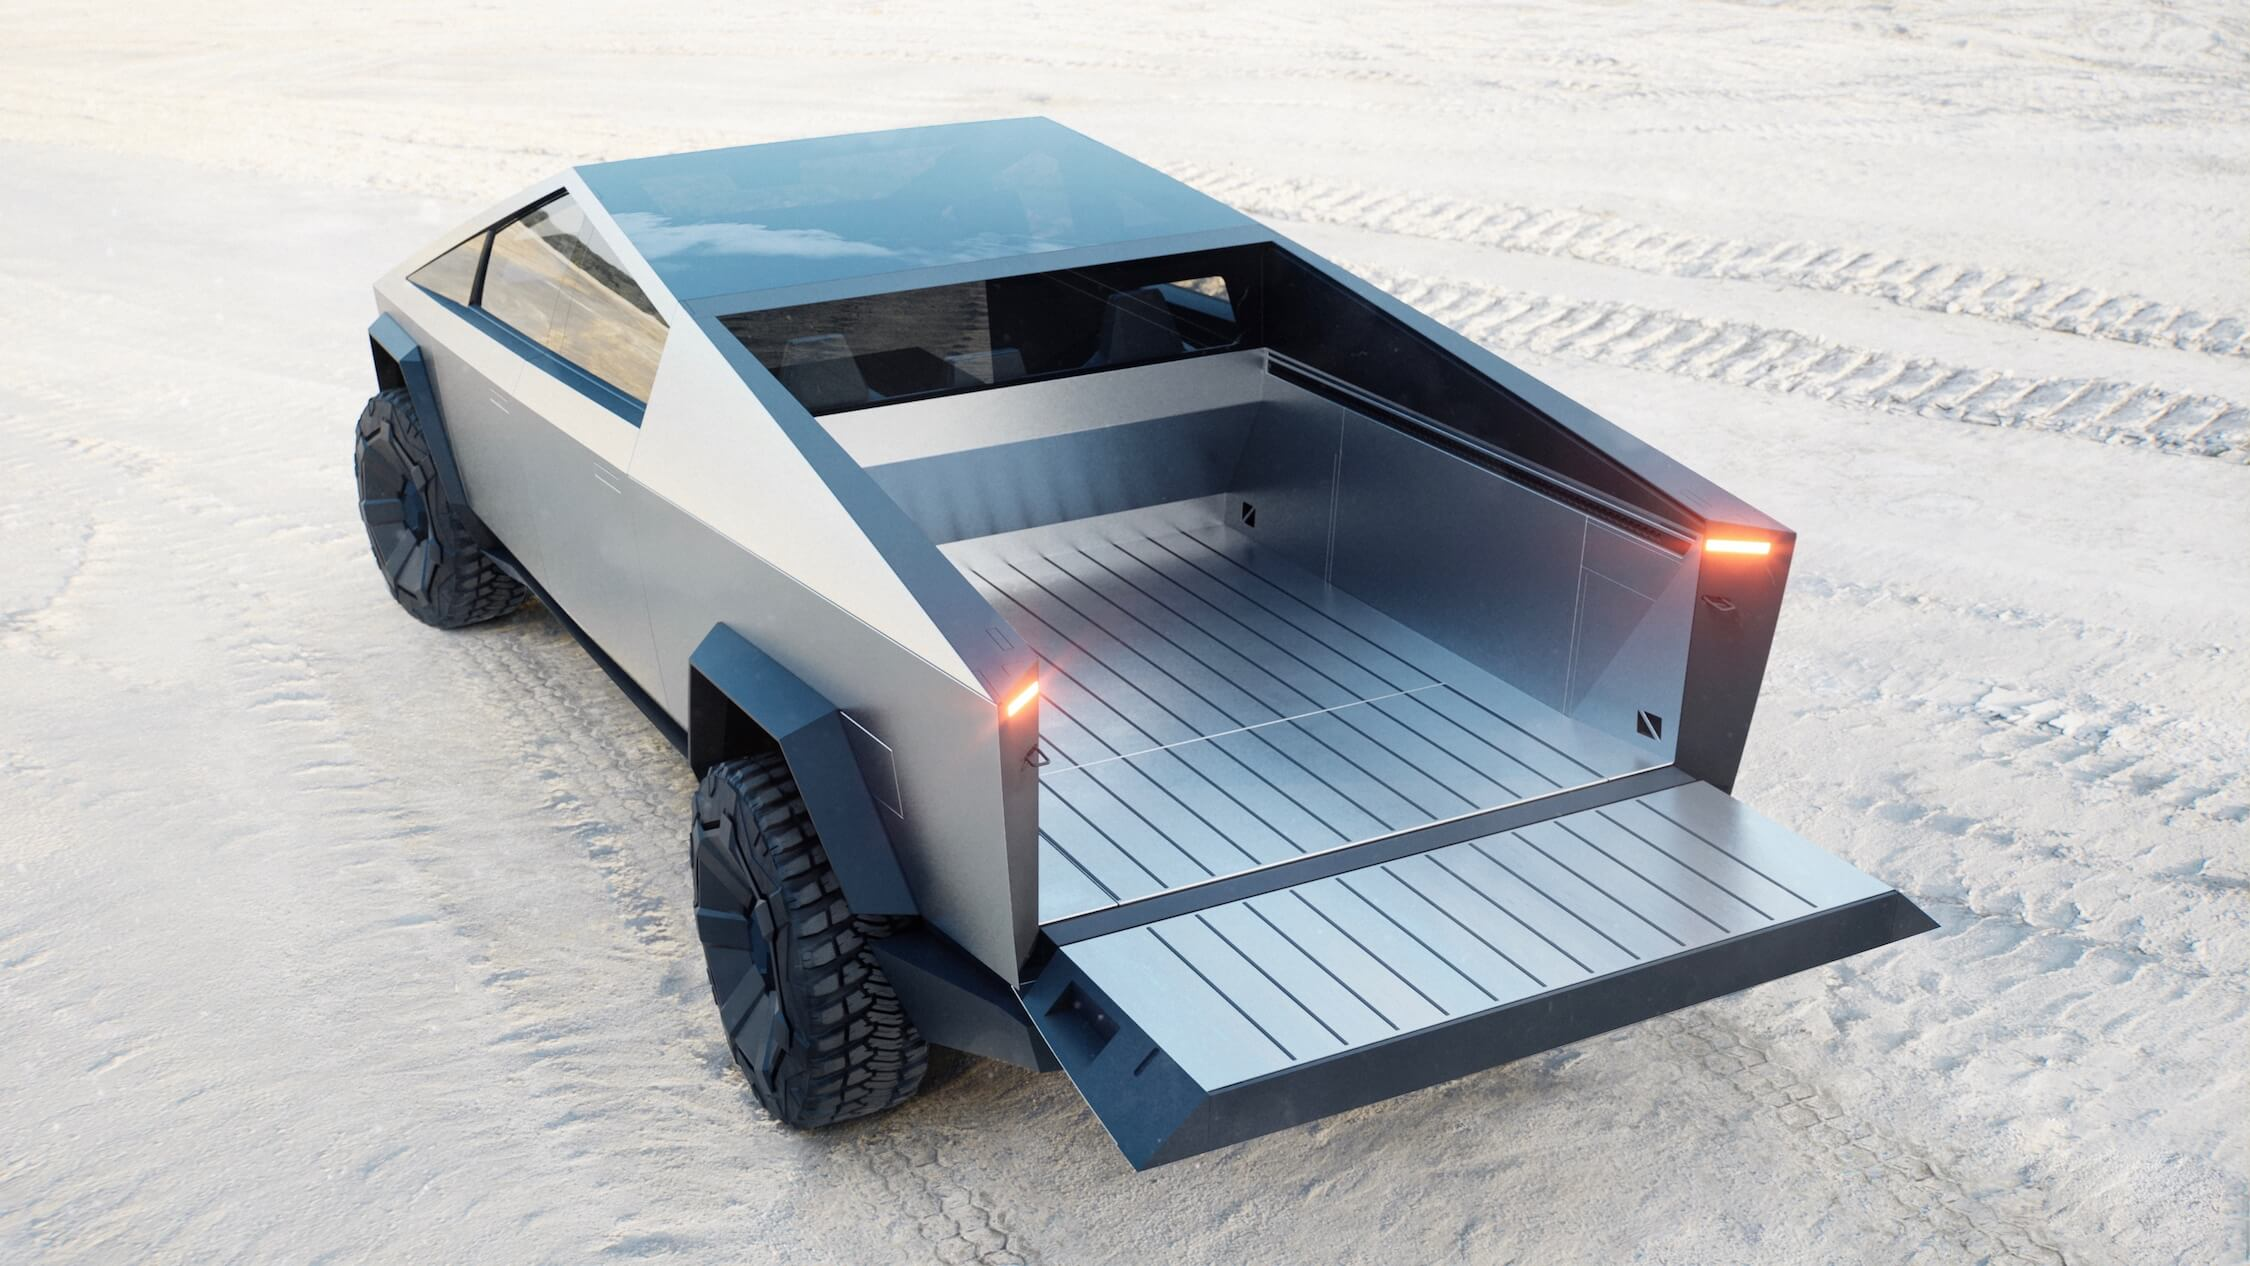 Tesla Cybertruck laadbak